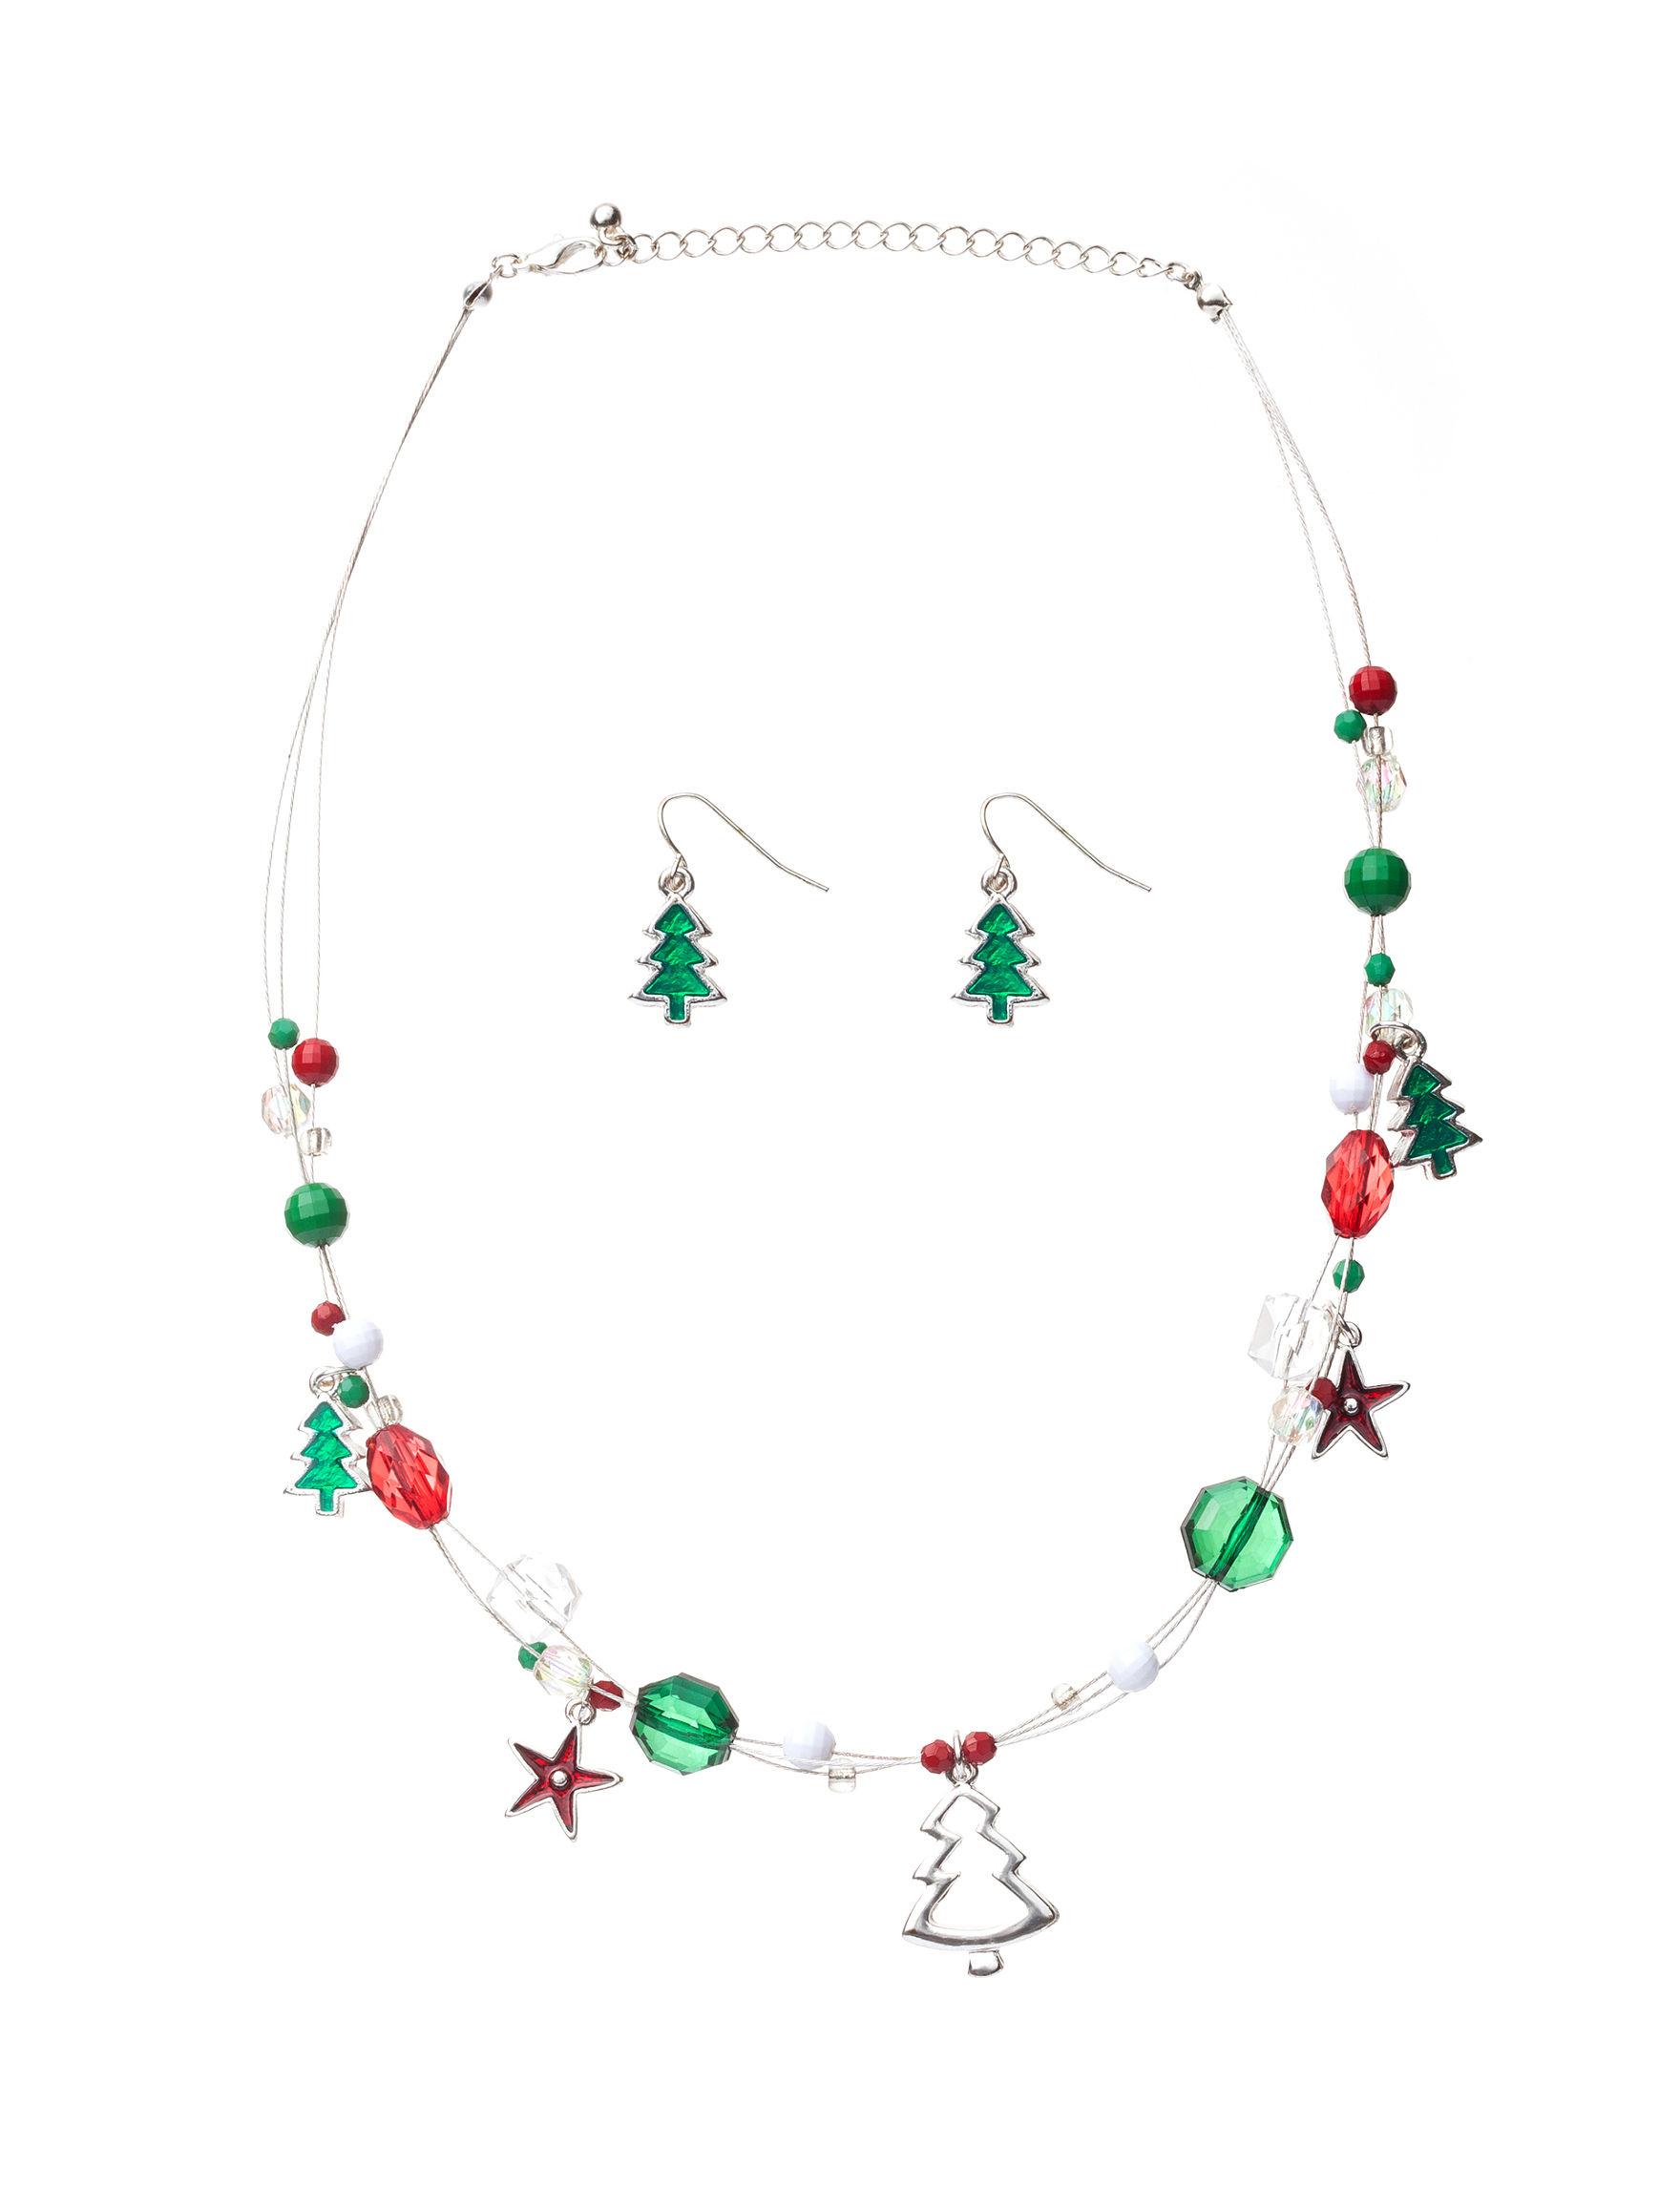 Hannah White / Silver Fashion Jewelry